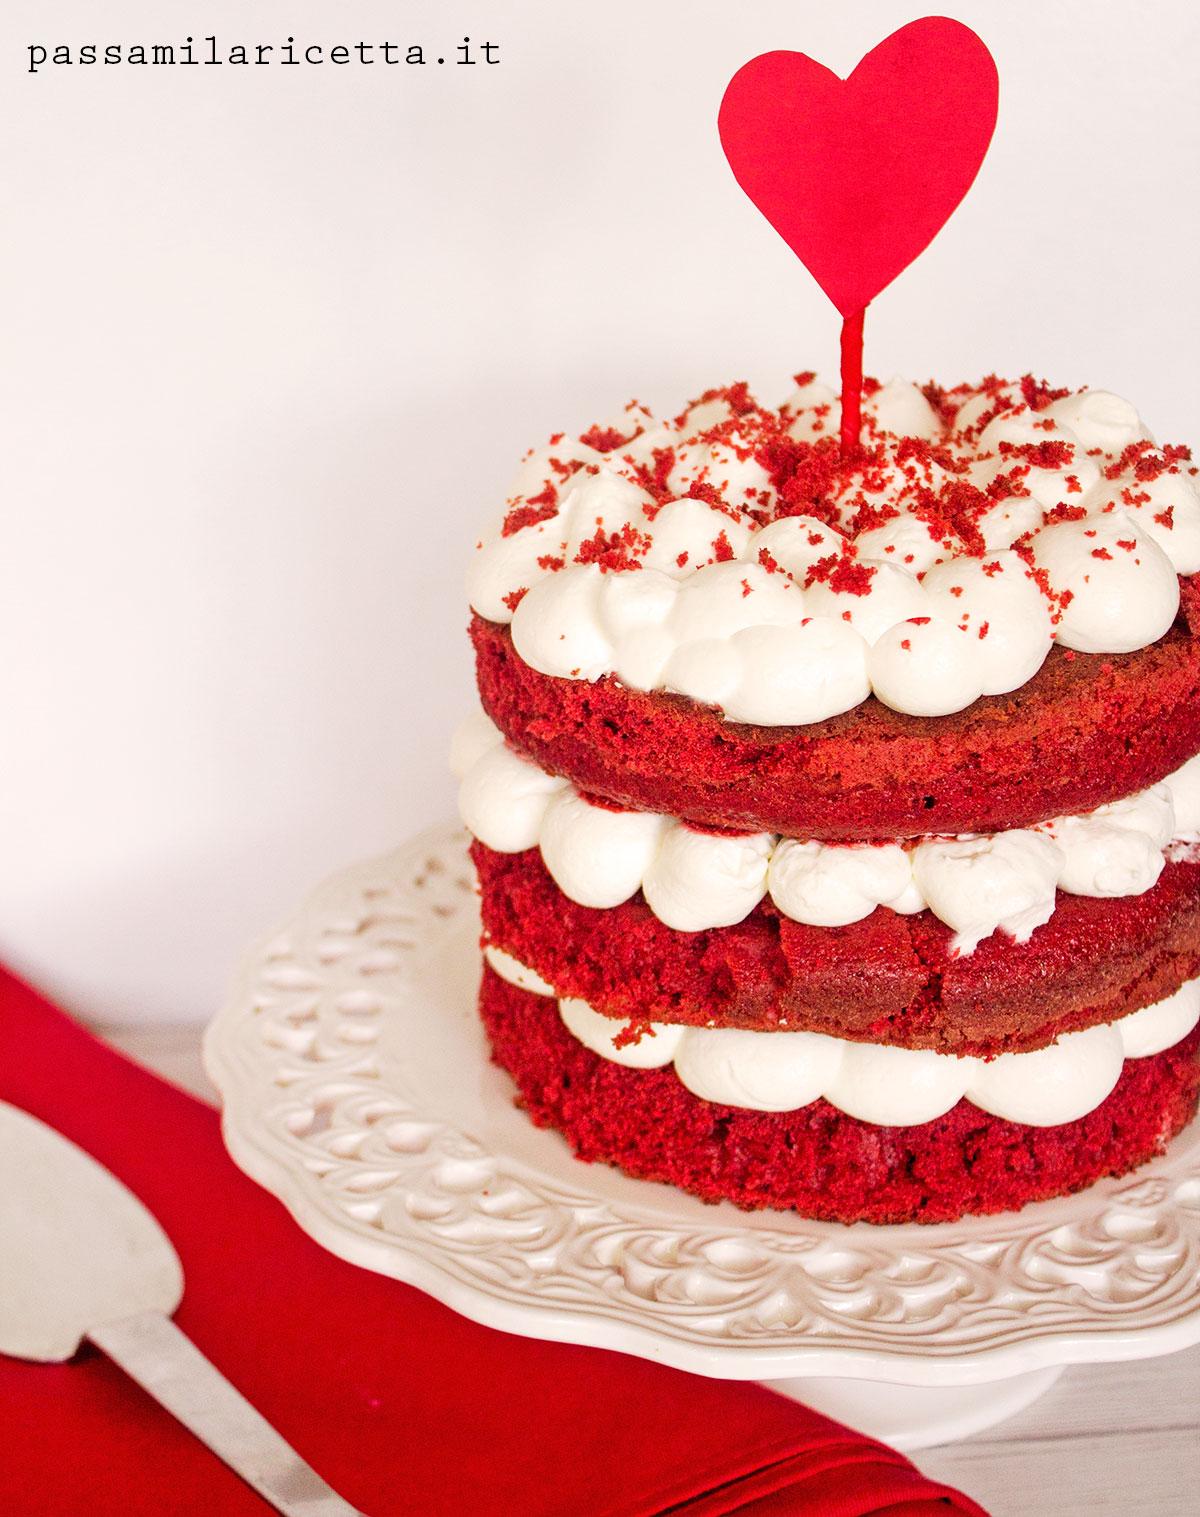 Ricetta Americana Red Velvet.Red Velvet Cake Ricetta Originale Americana Passami La Ricetta